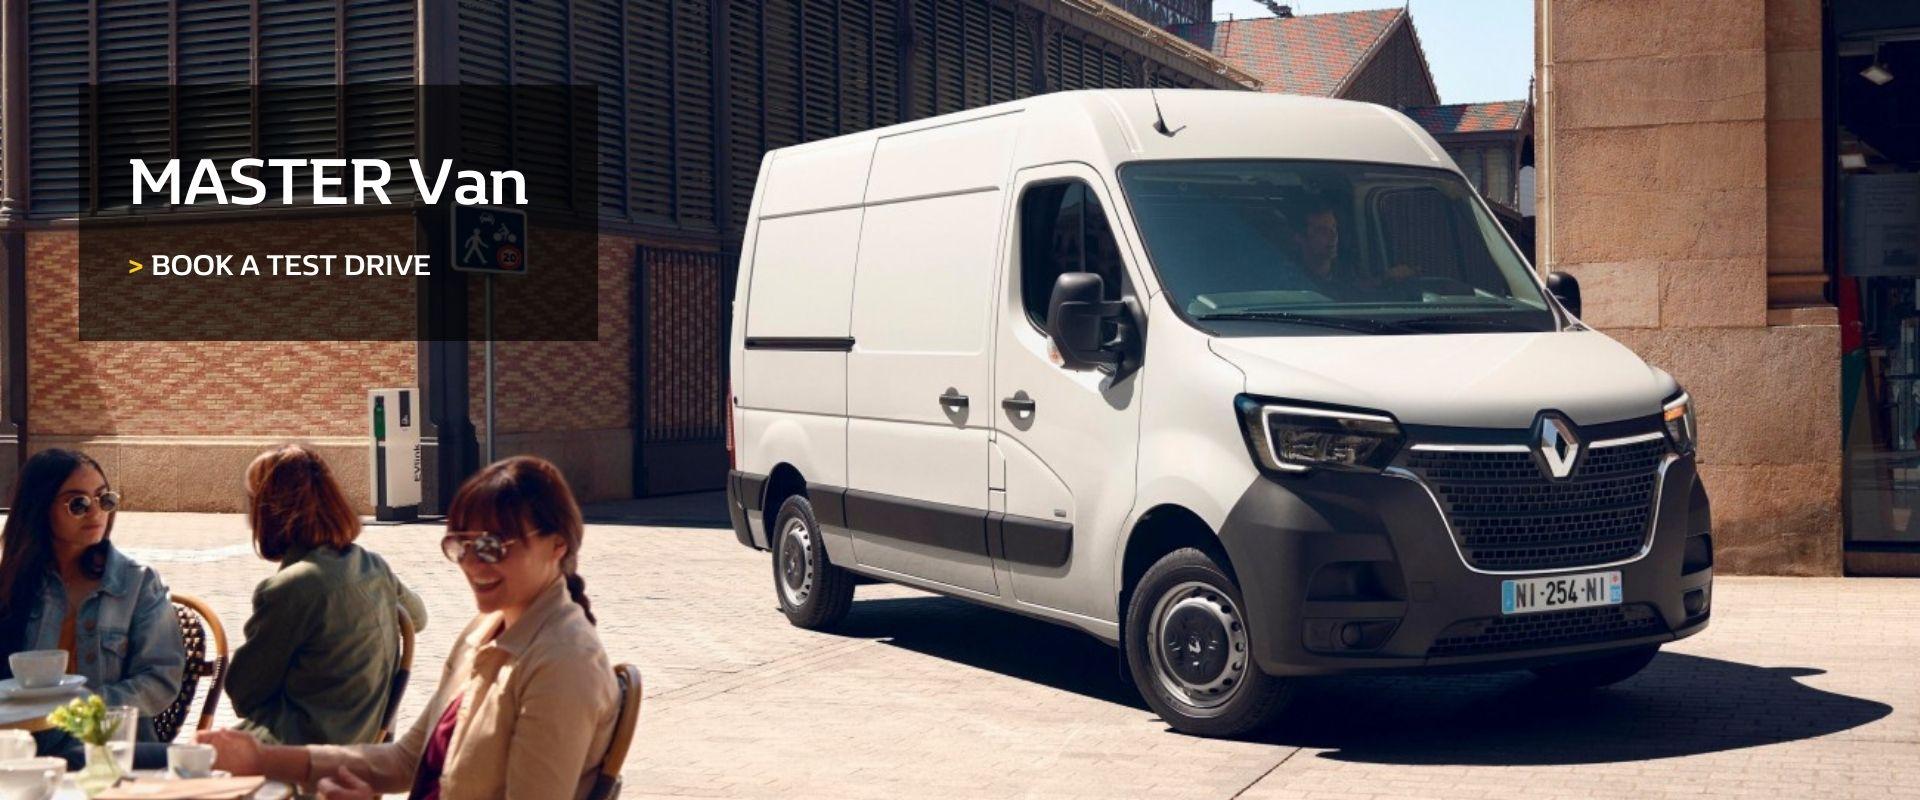 Renault Master Van -  Book a test drive today at Metro Renault